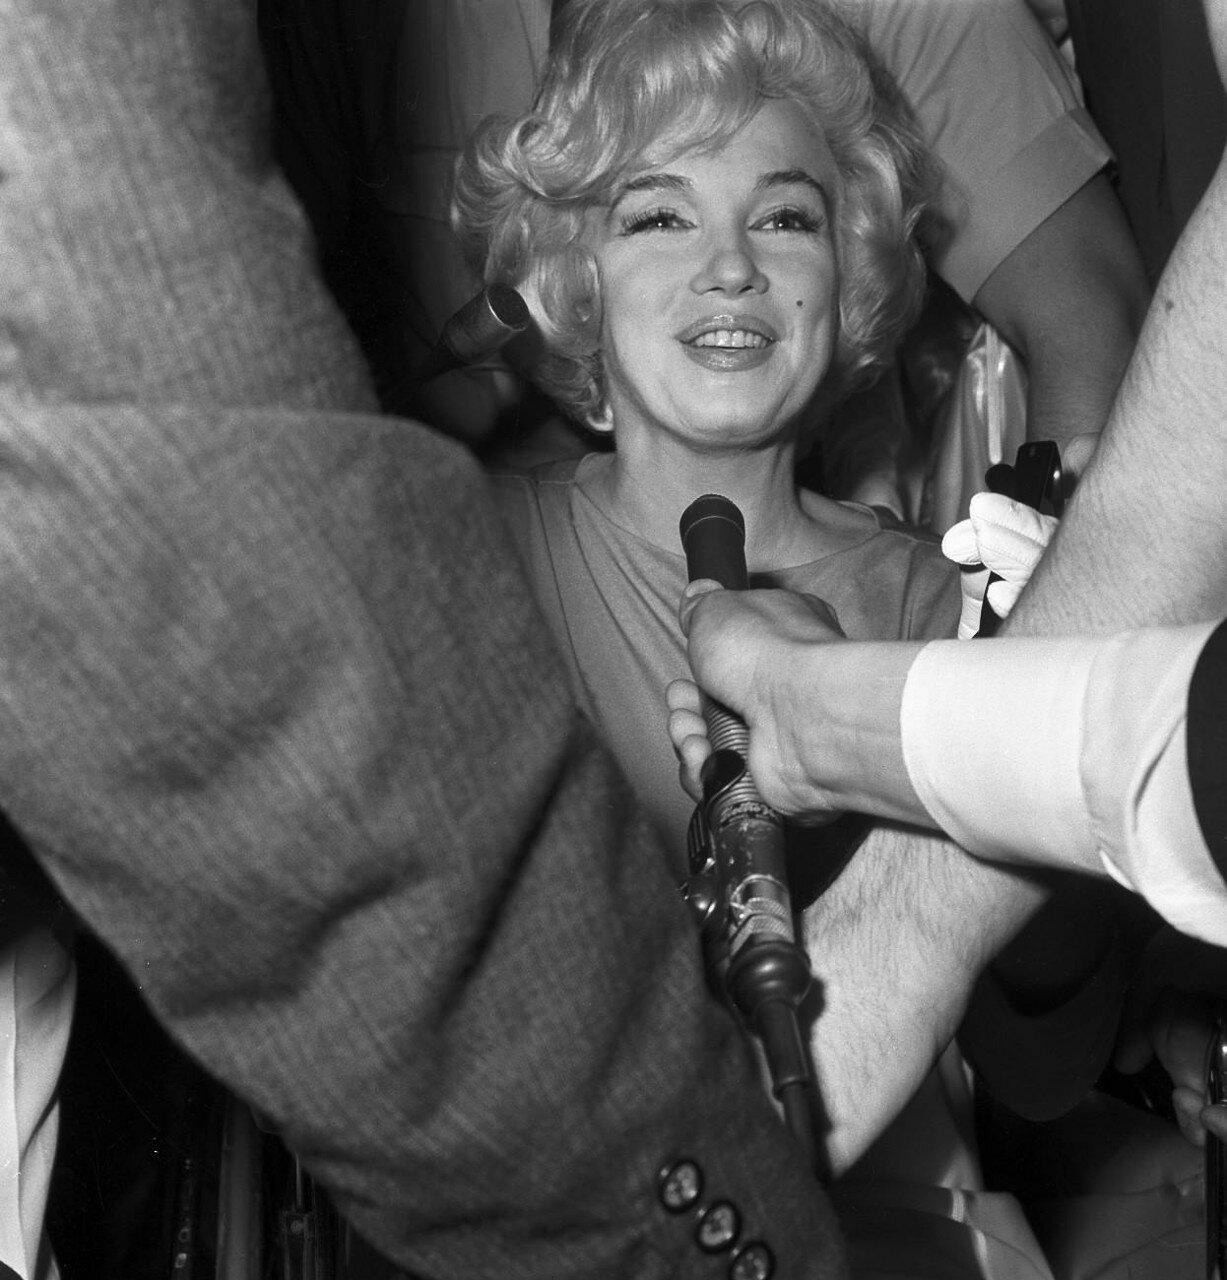 Newsmen Interviewing Marilyn Monroe